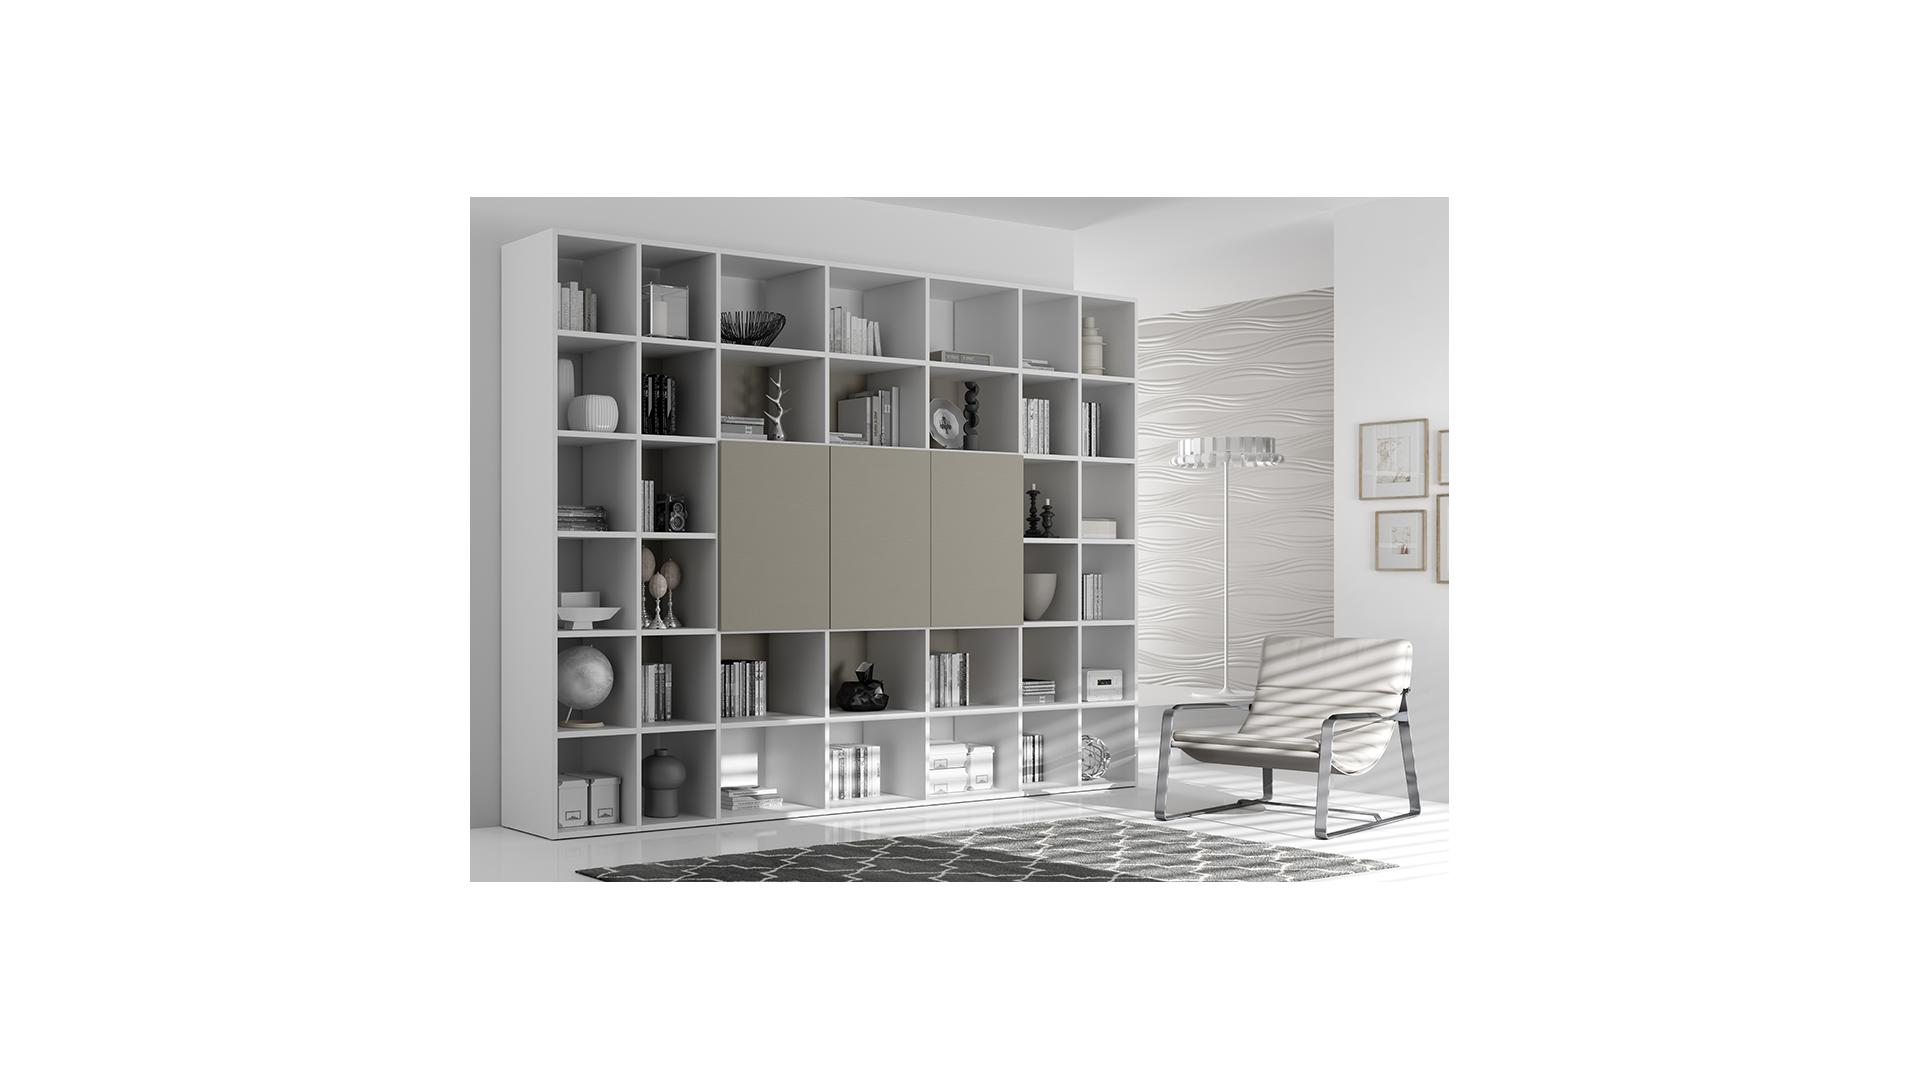 Bibliothèque Design PERSONNALISABLE AL10 avec portes push-pull - MORETTI COMPACT